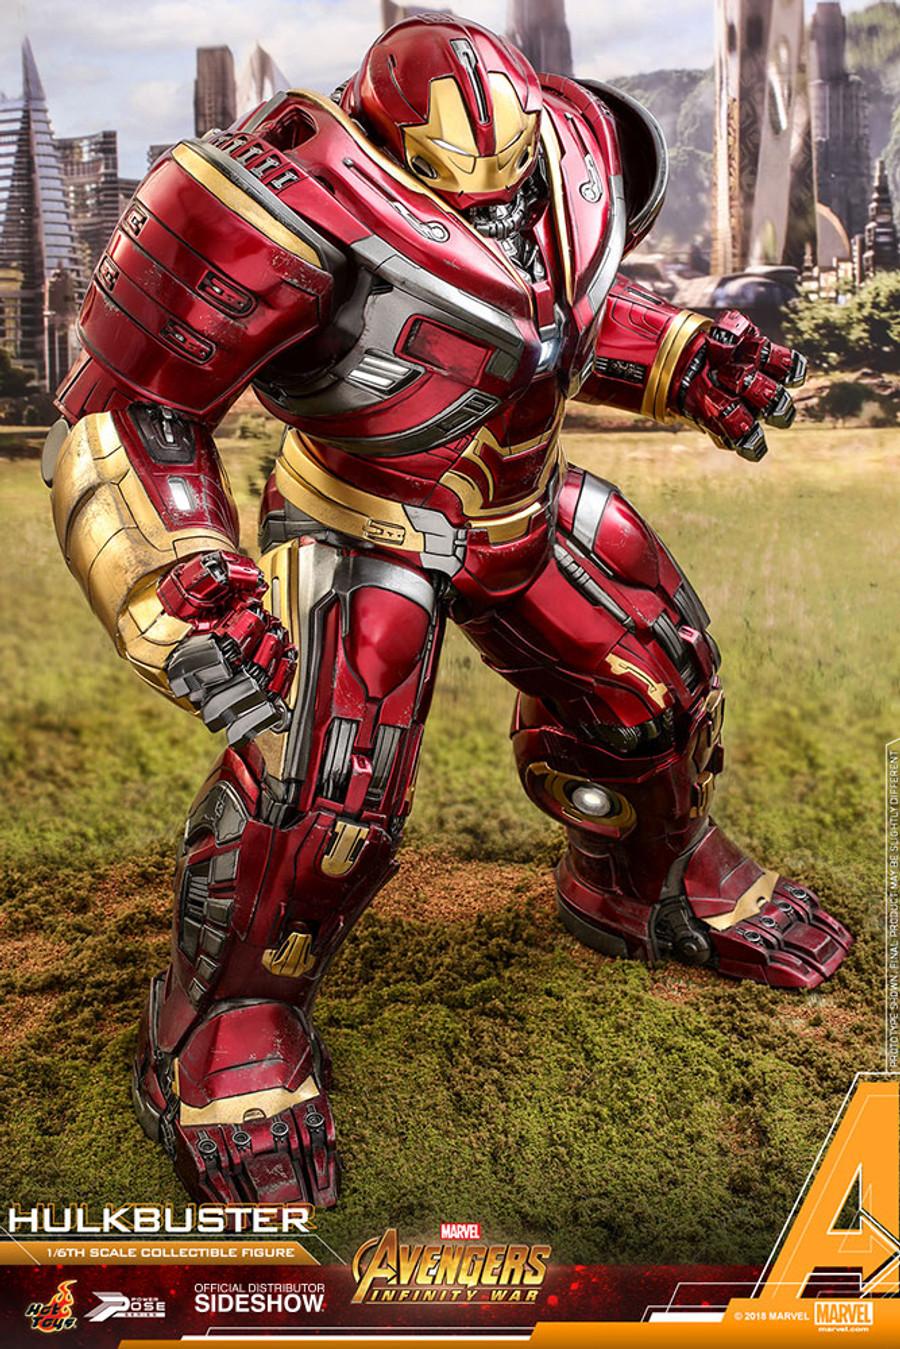 Hot Toys - Avengers: Infinity War - Hulkbuster